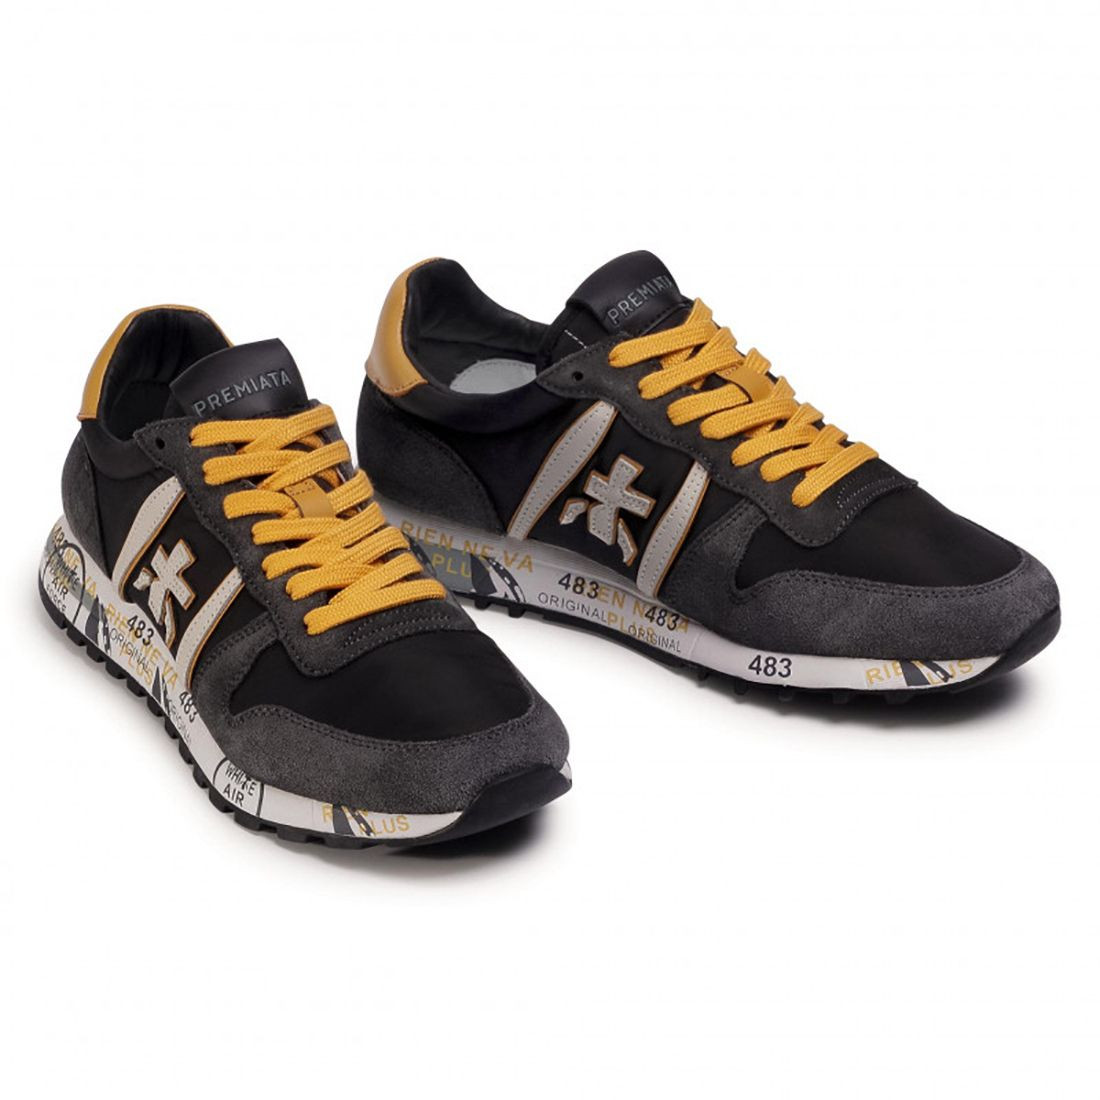 sneakers uomo premiata eric4944 9033